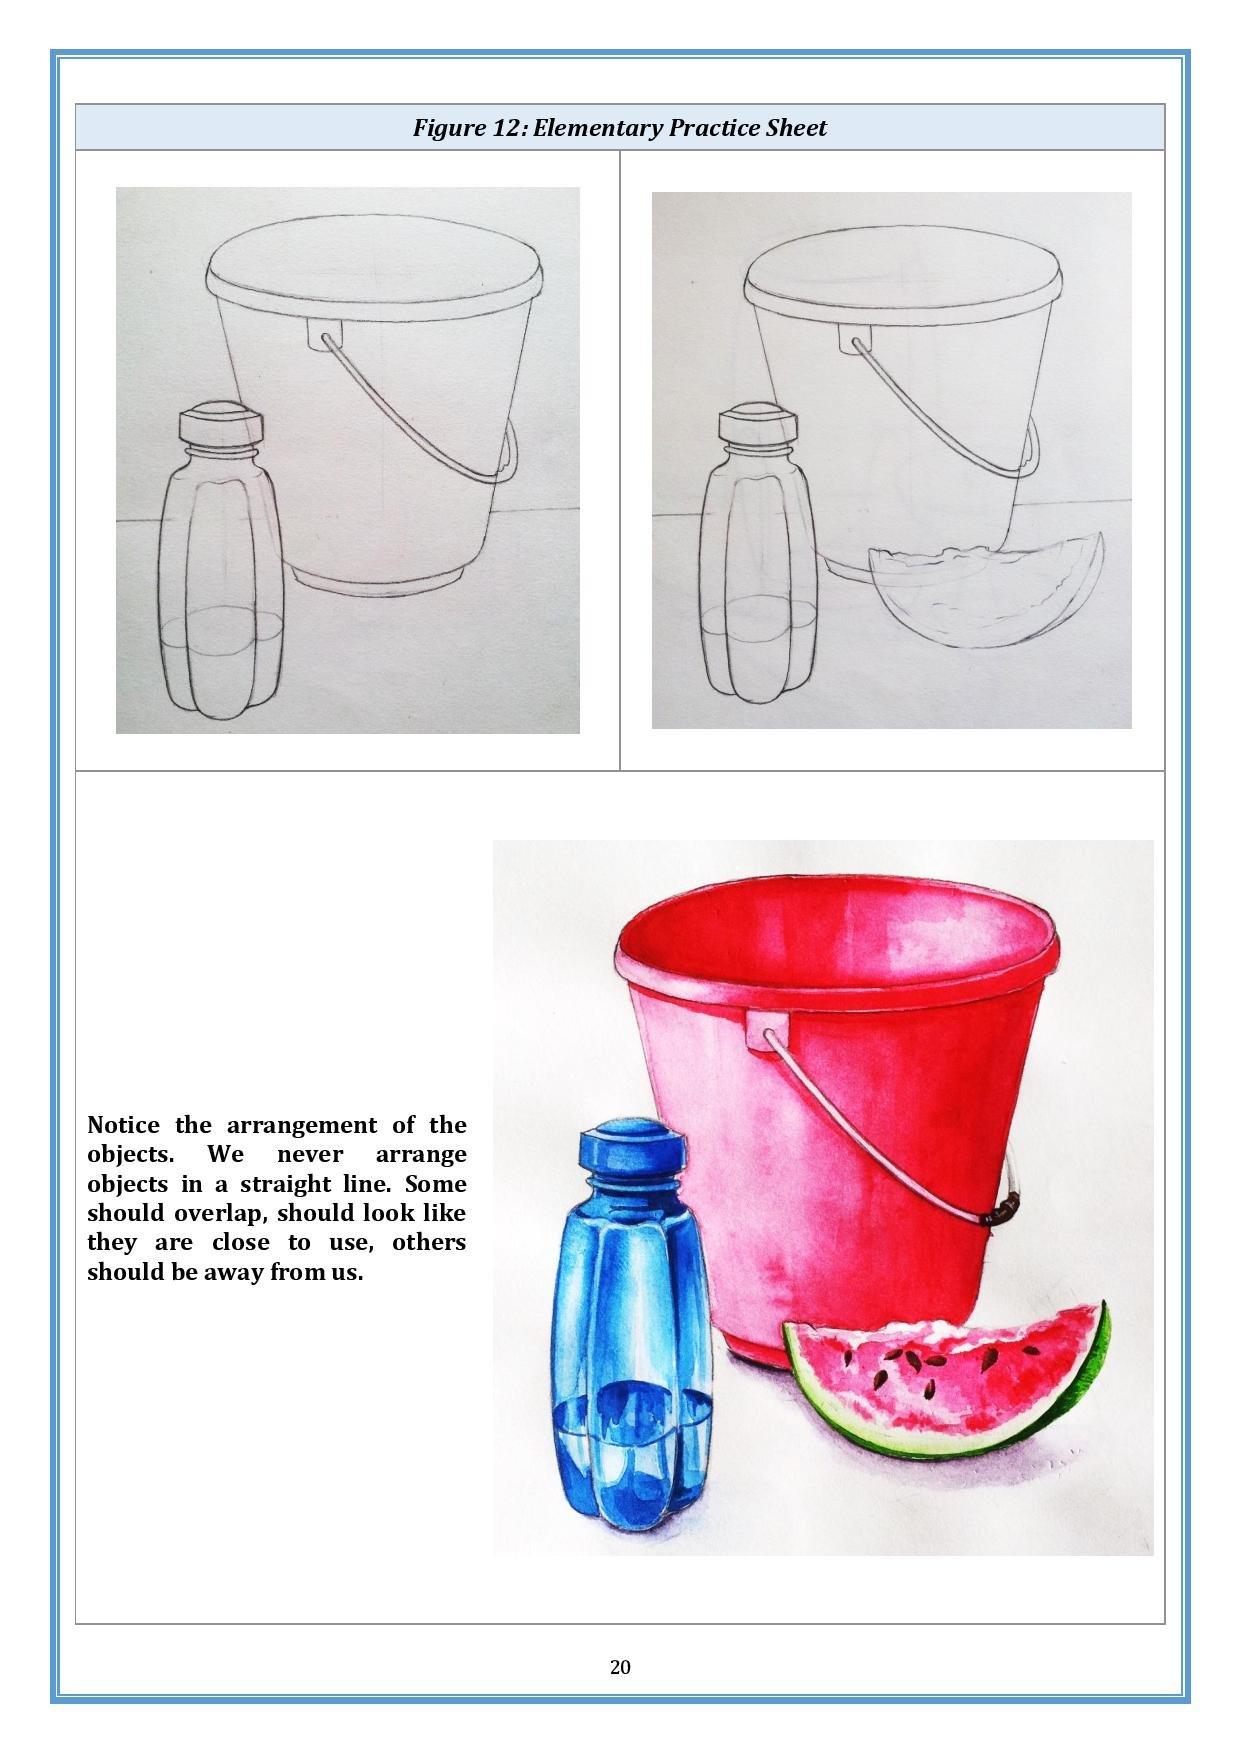 1241x1753 Buy Preeta's Drawing Book For Elementary And Intermediate Grade